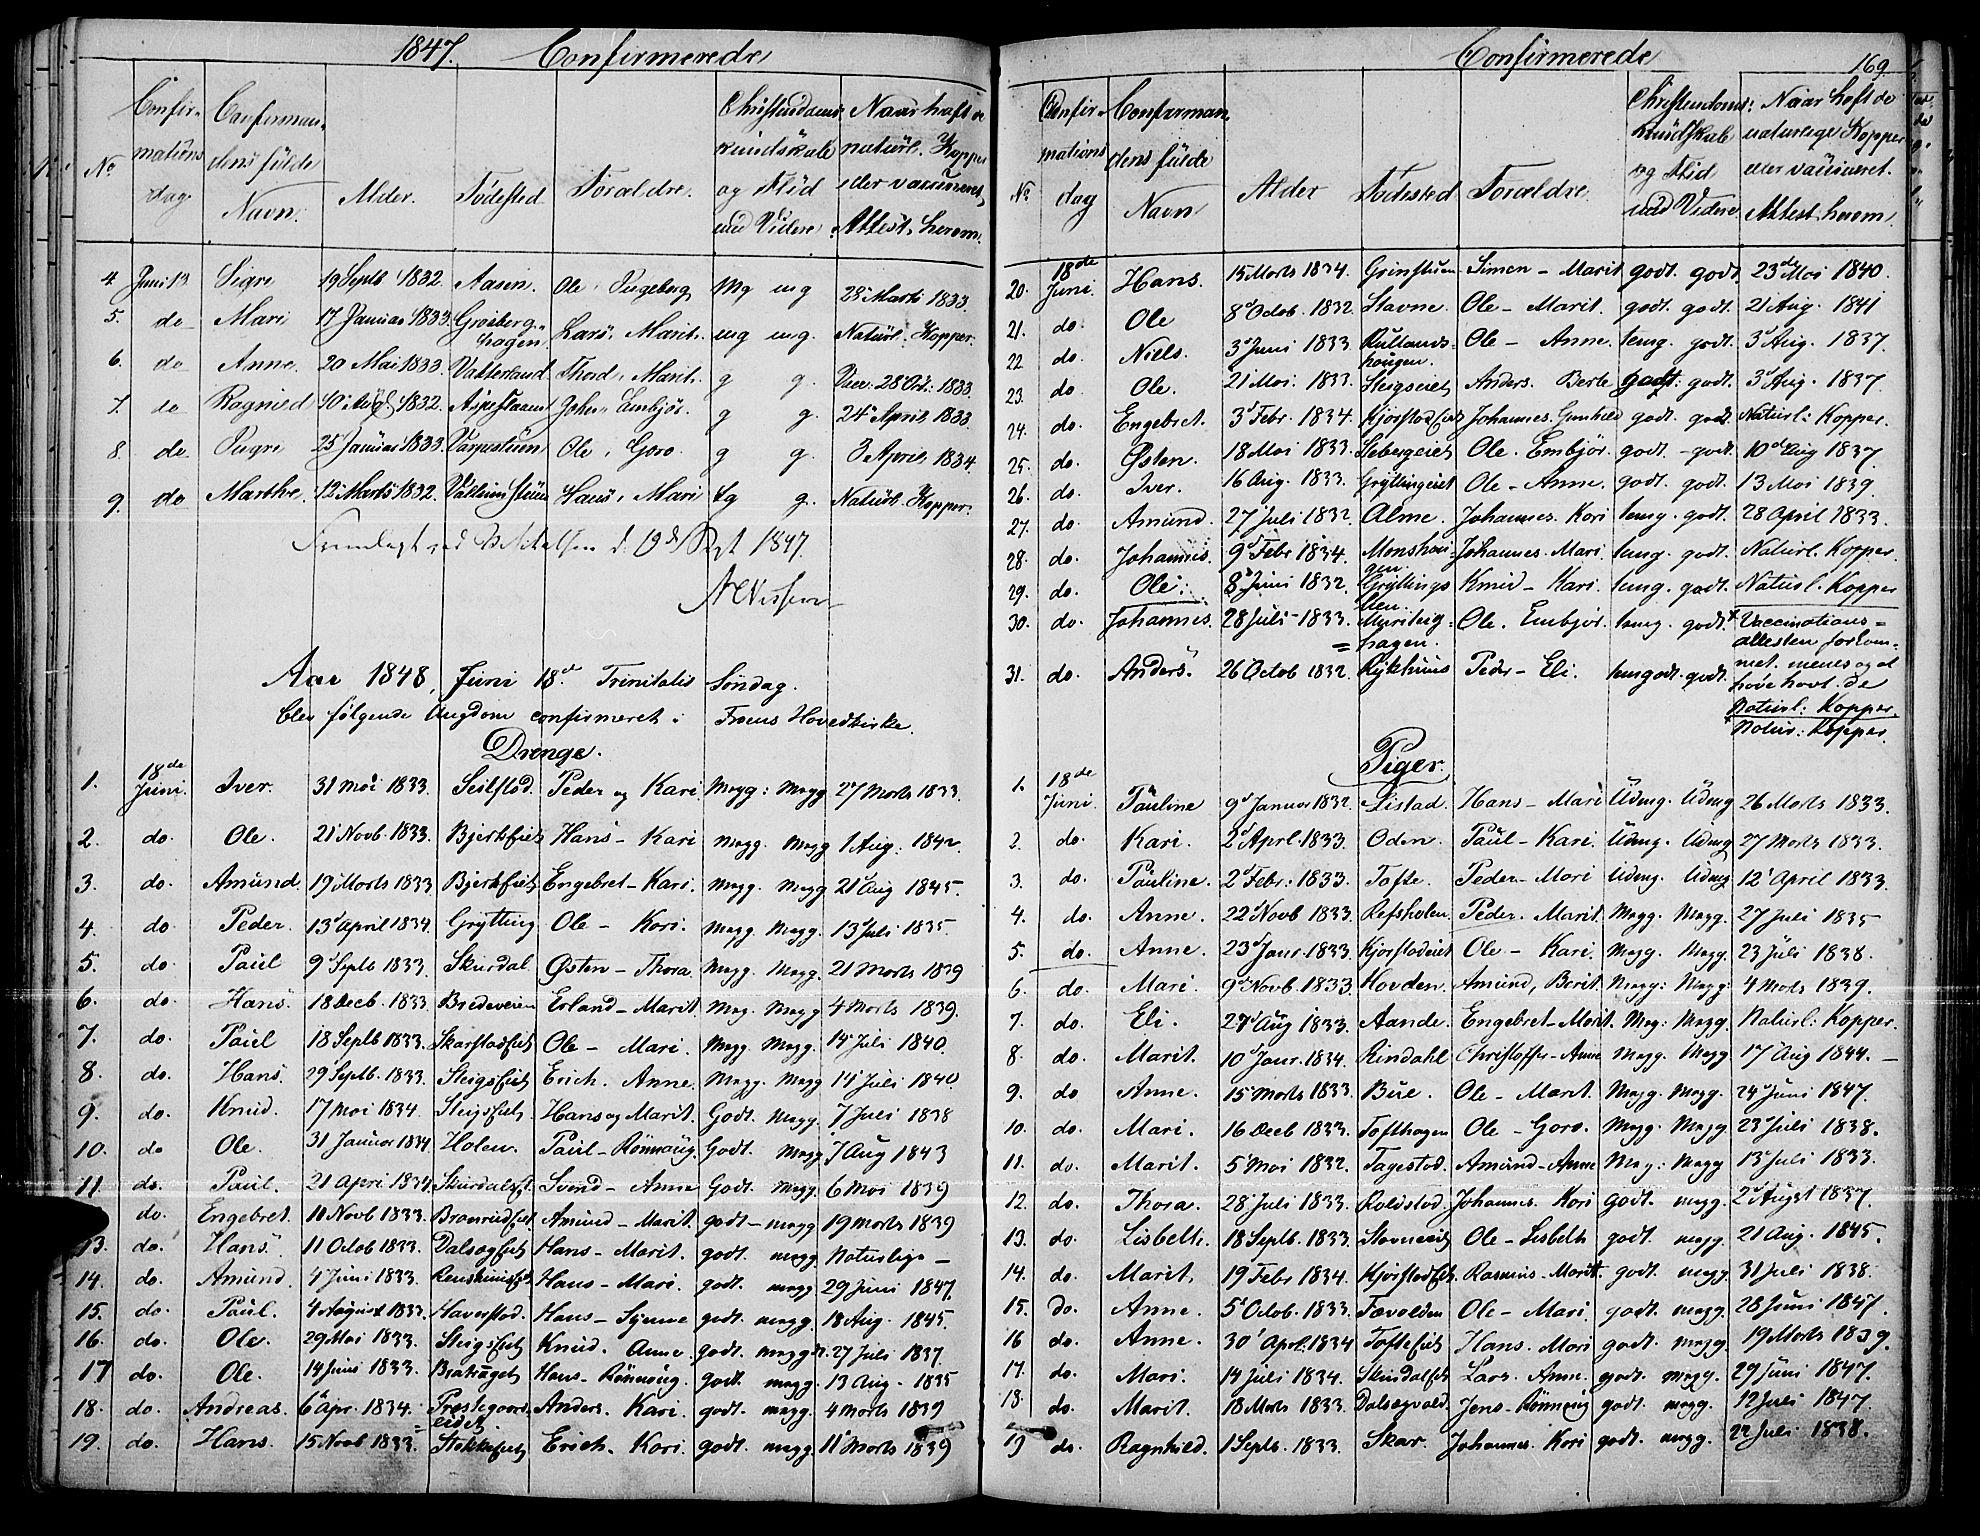 SAH, Fron prestekontor, H/Ha/Haa/L0004: Ministerialbok nr. 4, 1839-1848, s. 169